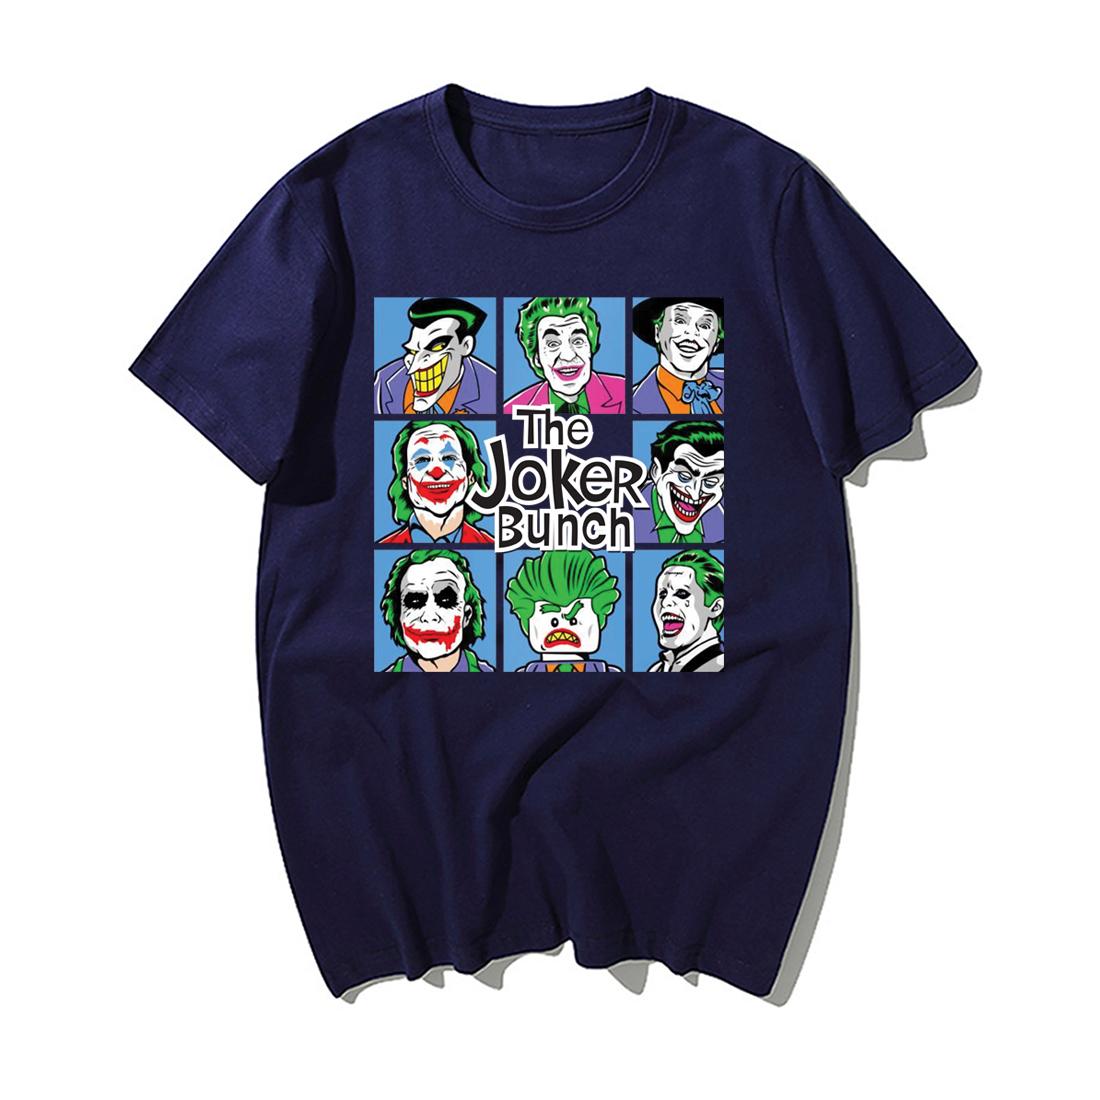 Funny Jokers T Shirt Men Fashion The Joker Bunch Print Tshirt Summer Hip Hop Tops Streetwear Casual Cotton Short Sleeve Tshirts